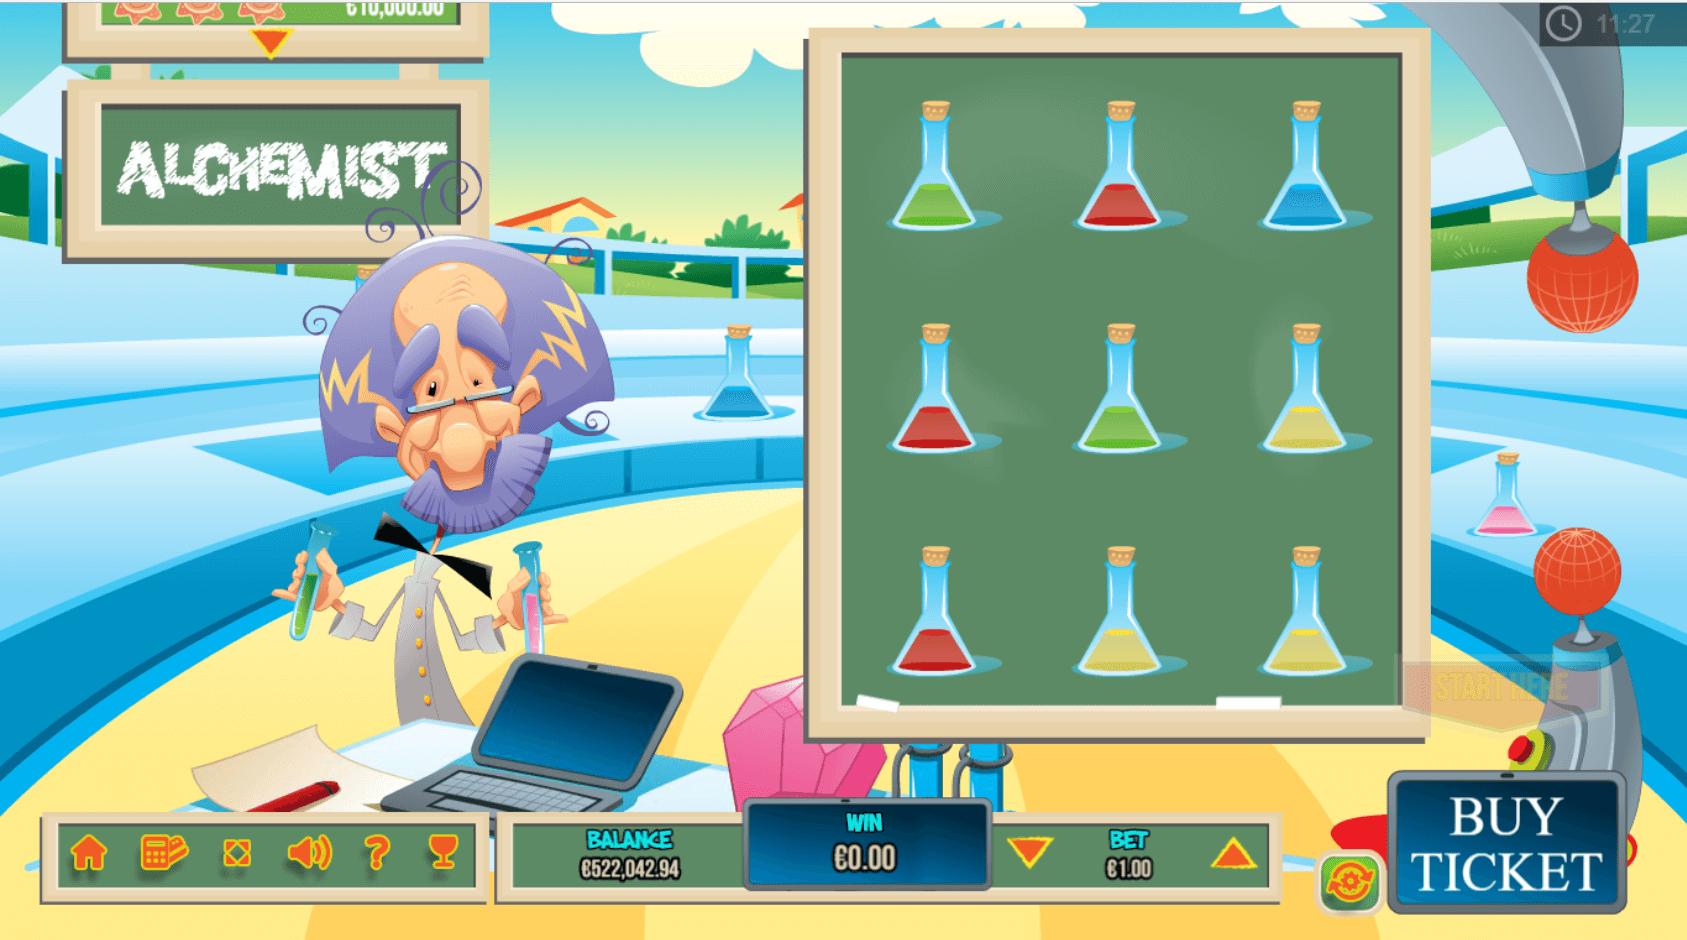 The Alchemist game starting scene.png